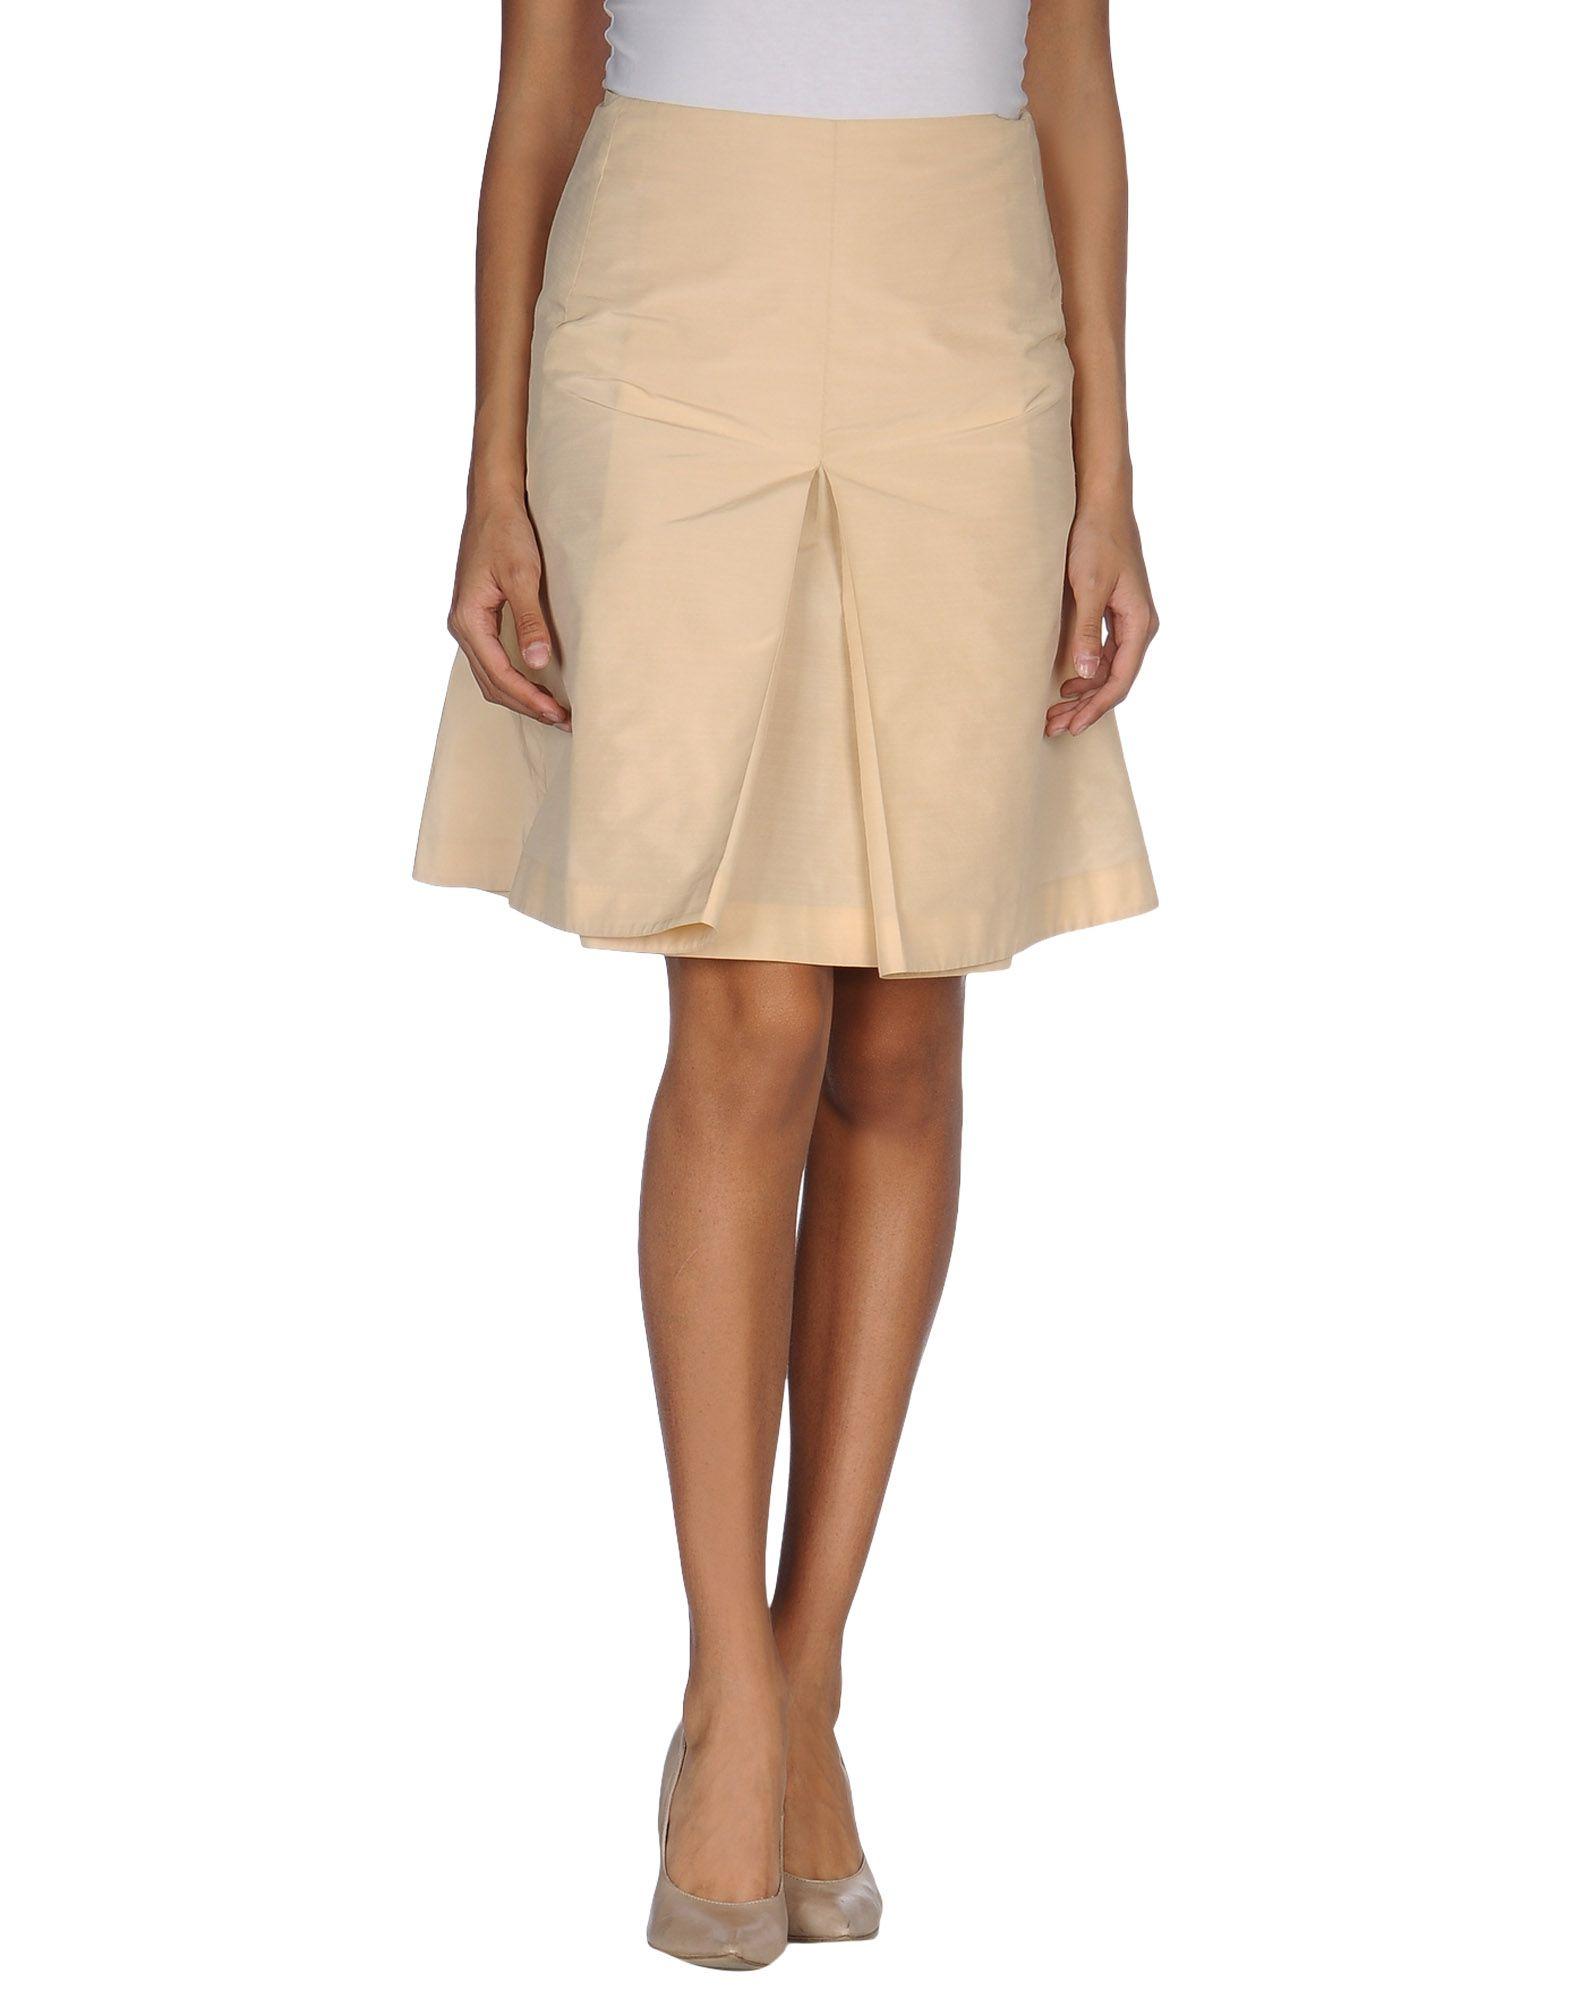 knee length skirt in beige save 82 lyst